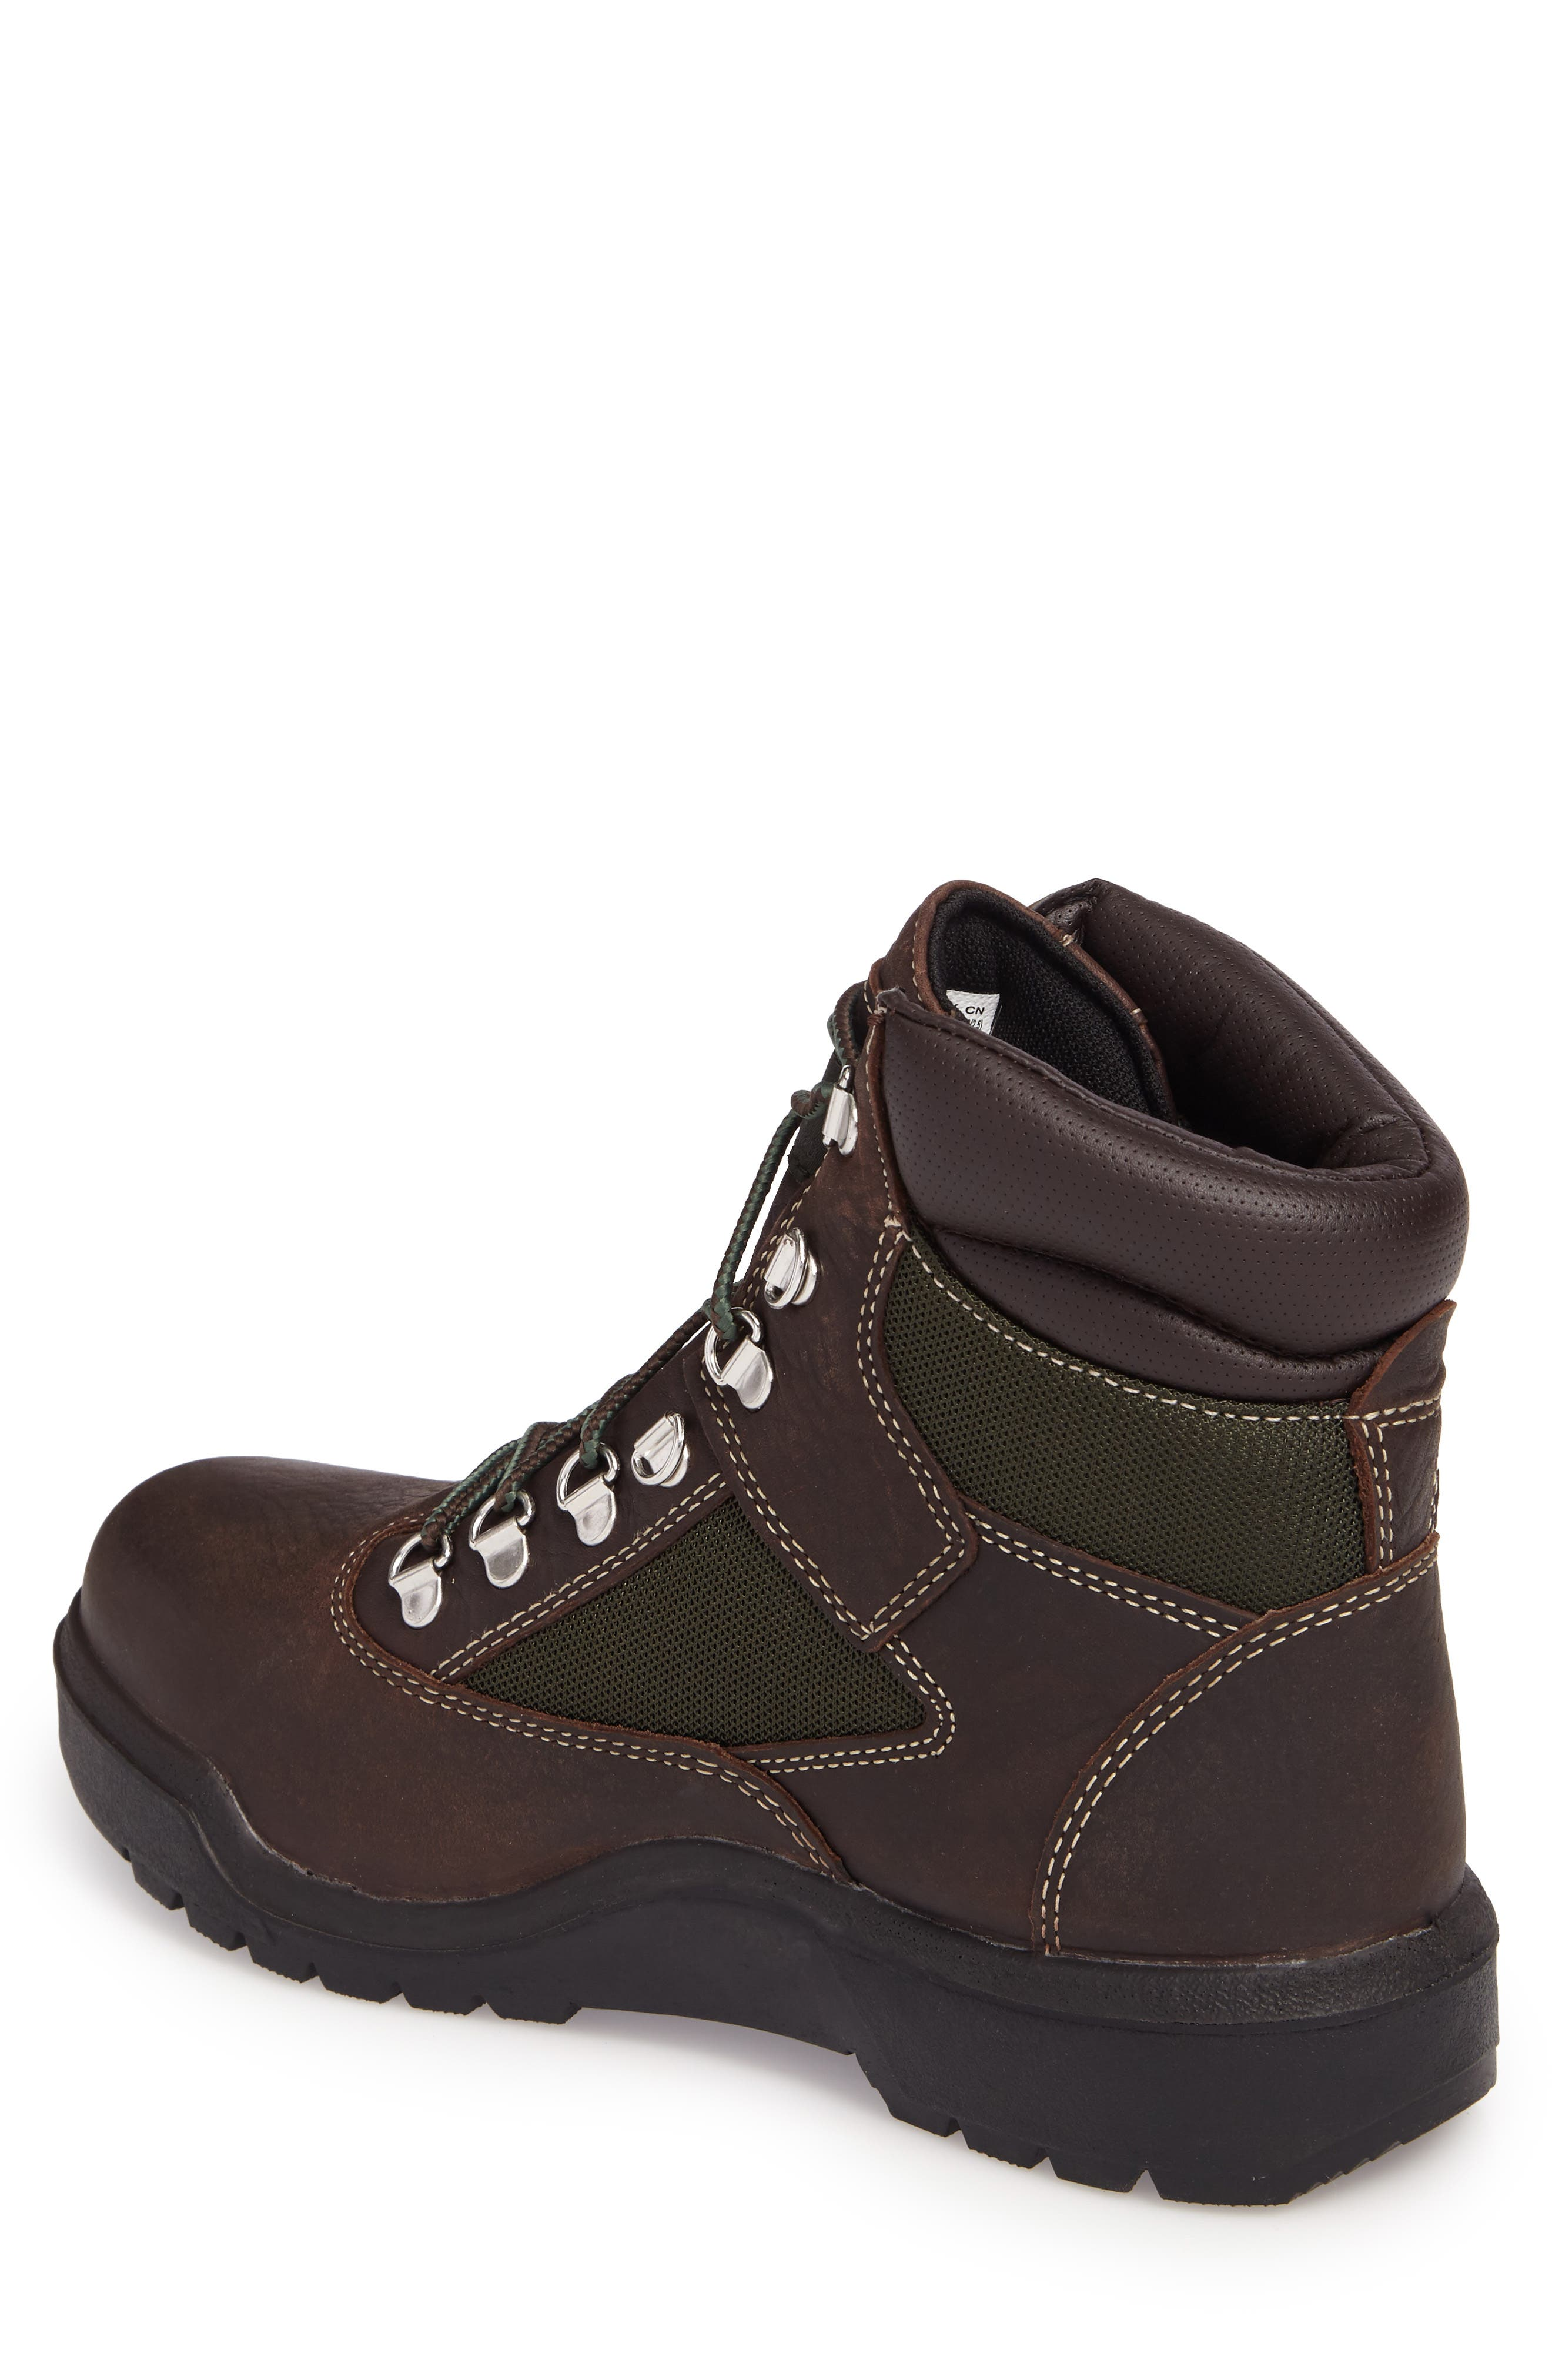 Field Waterproof Winter Boot,                             Alternate thumbnail 2, color,                             Hazel Highway Leather